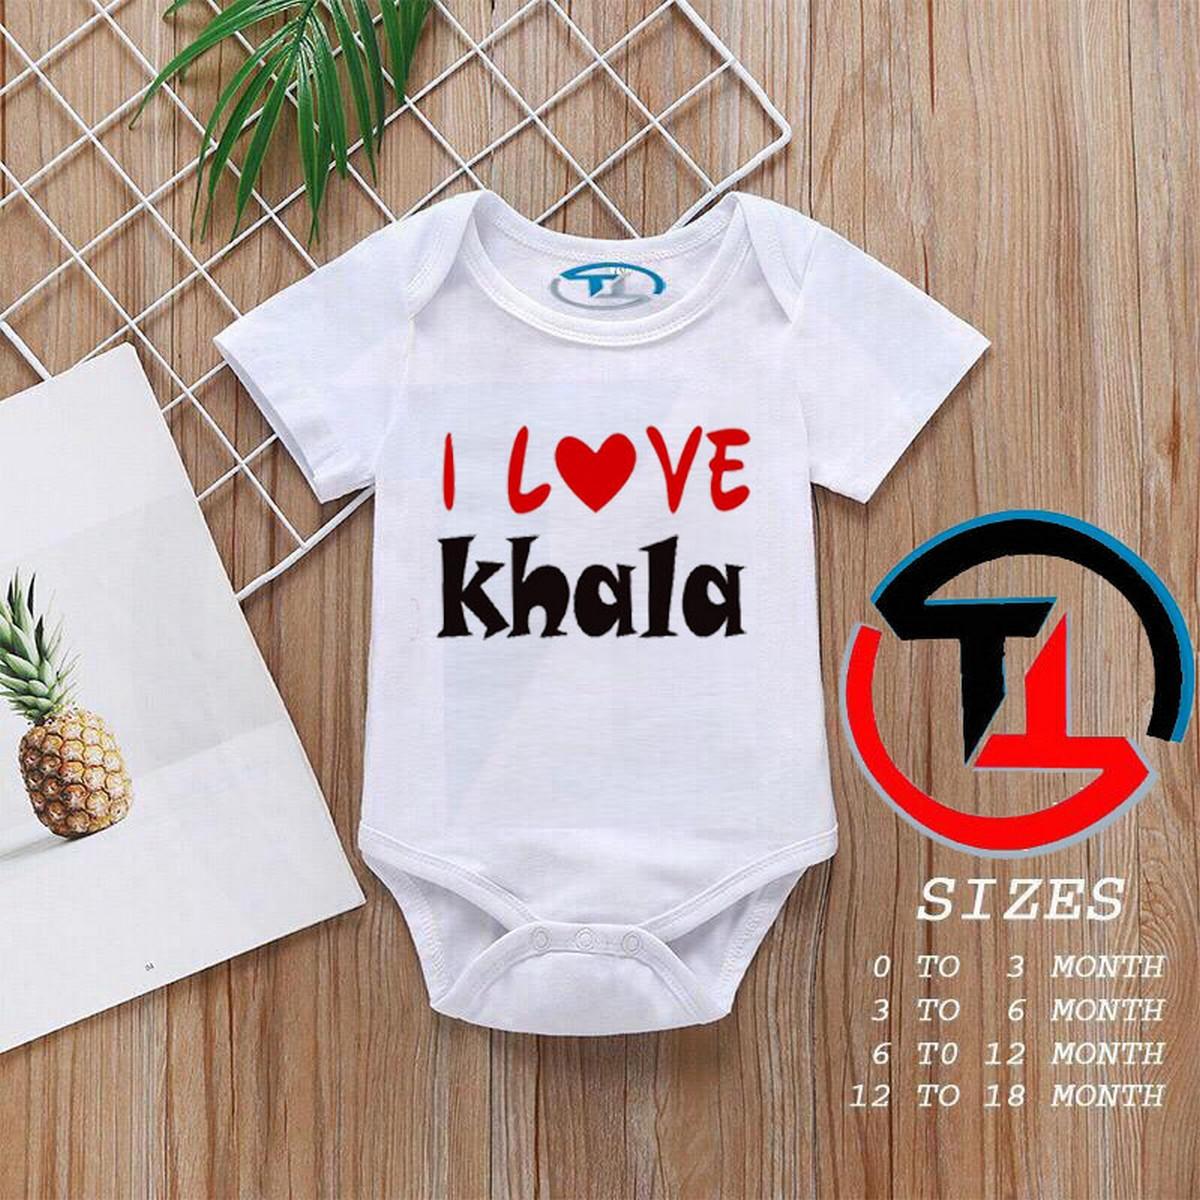 Baby Girls and Boys Half Sleeves Cotton Body suits Summer Wear, Romper Infants Onesies (LOVE KHALA)